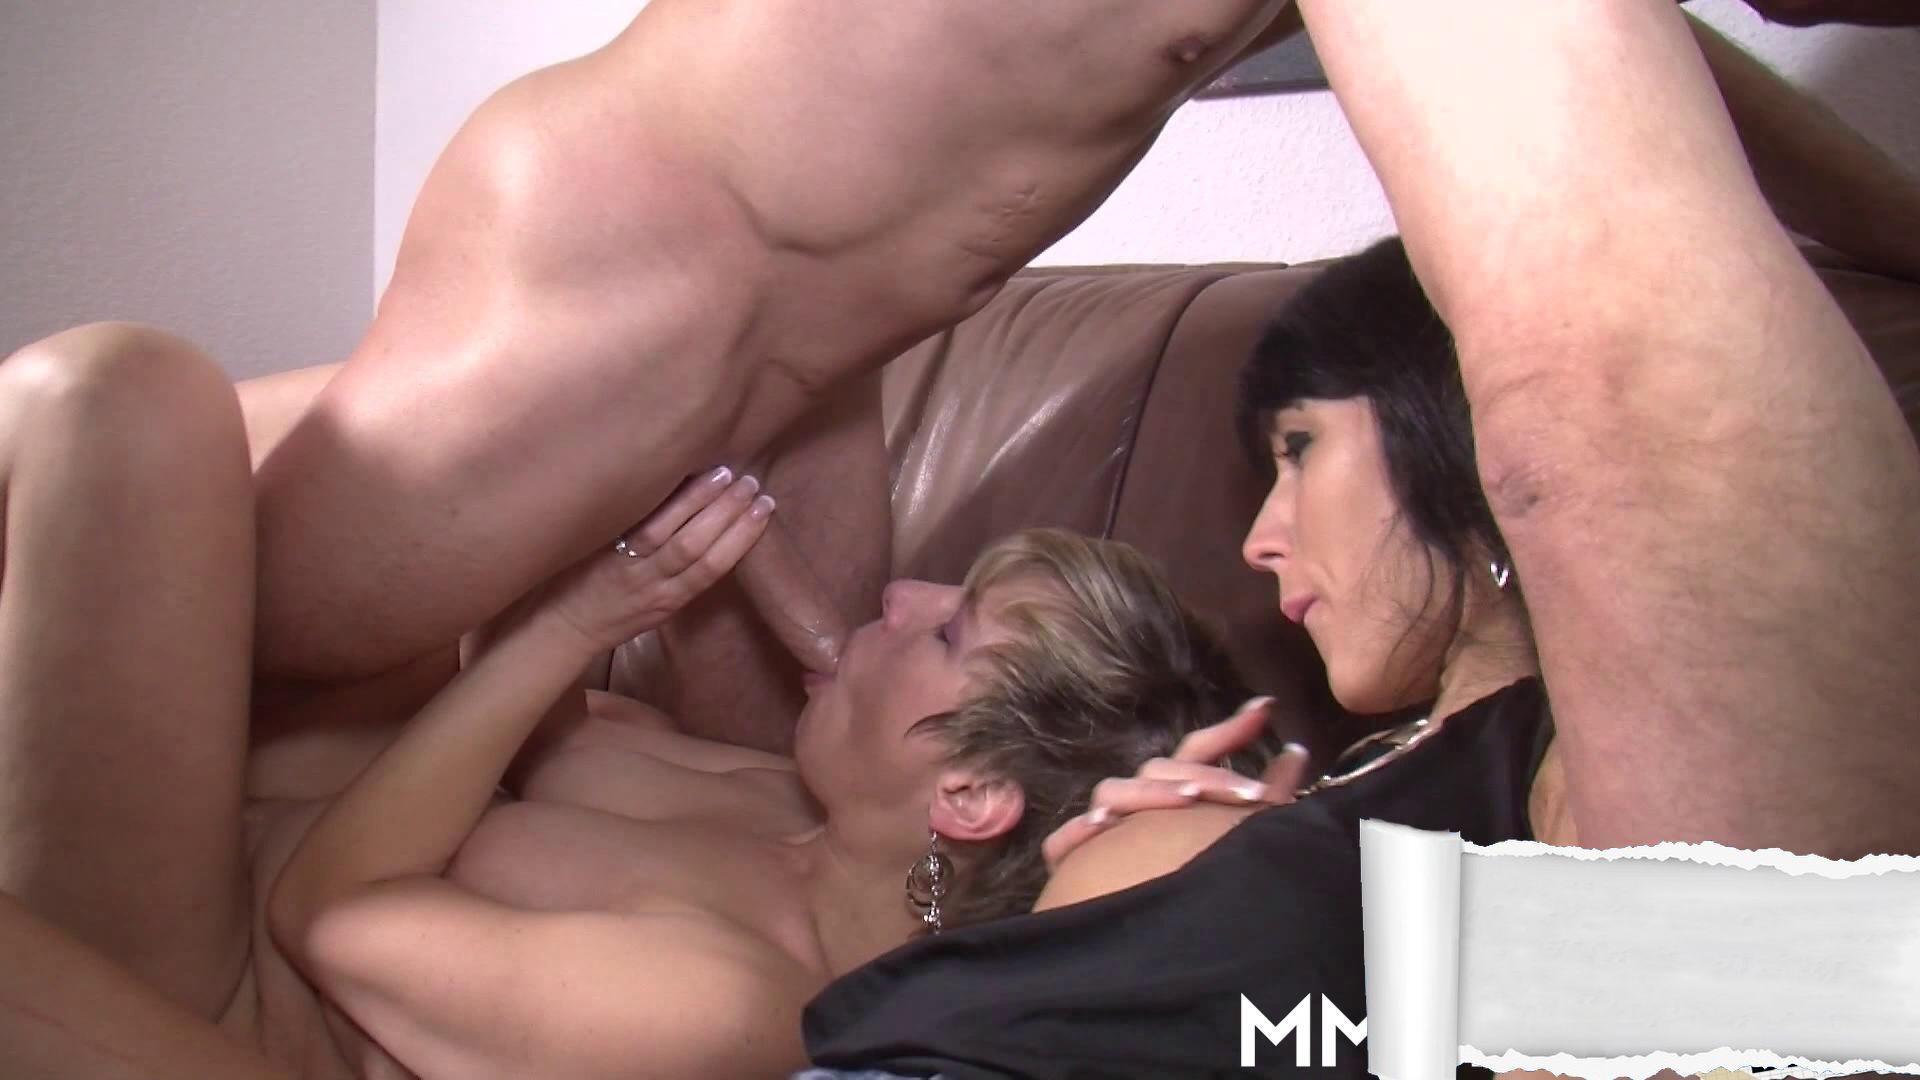 Candela X Escort sex like party - gangbang, group sex, threesome, orgy